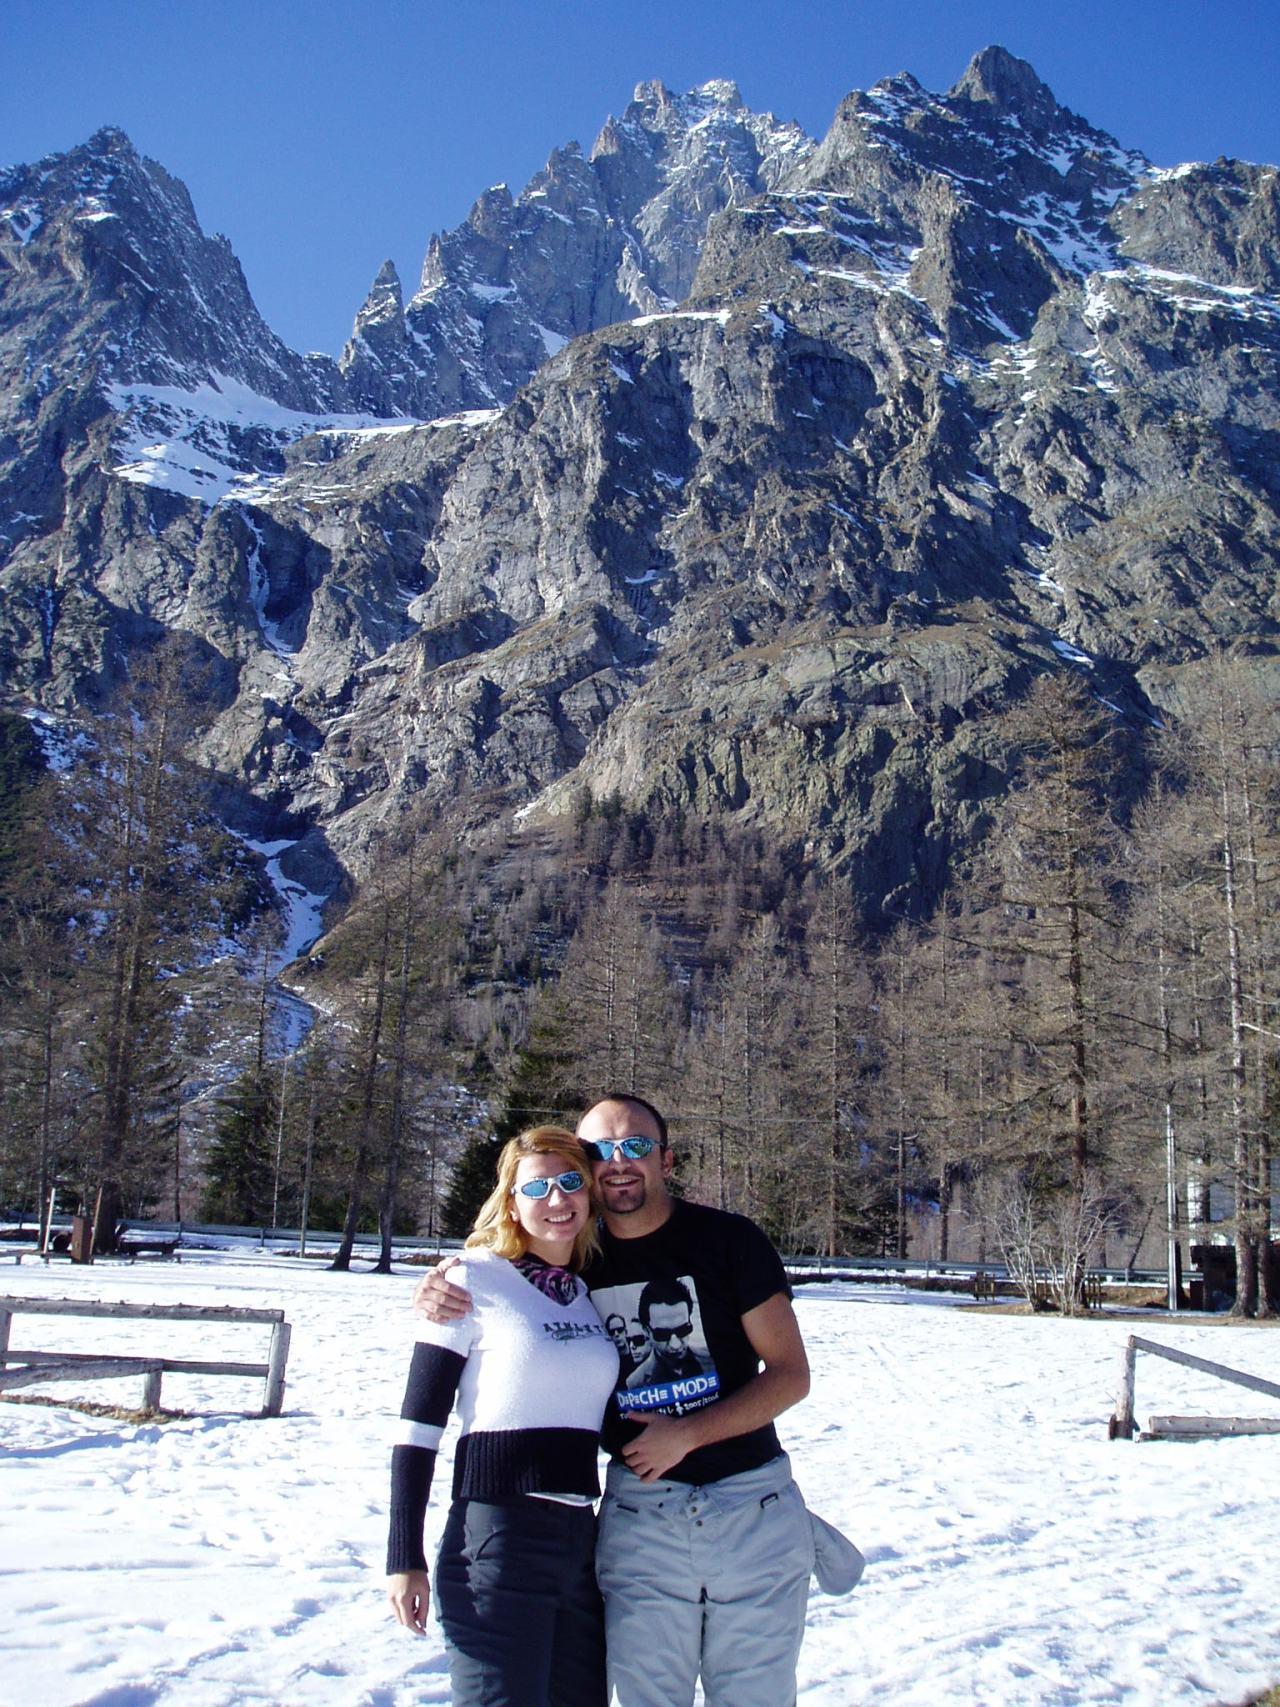 Best ski resorts in Europe: Courmayeur